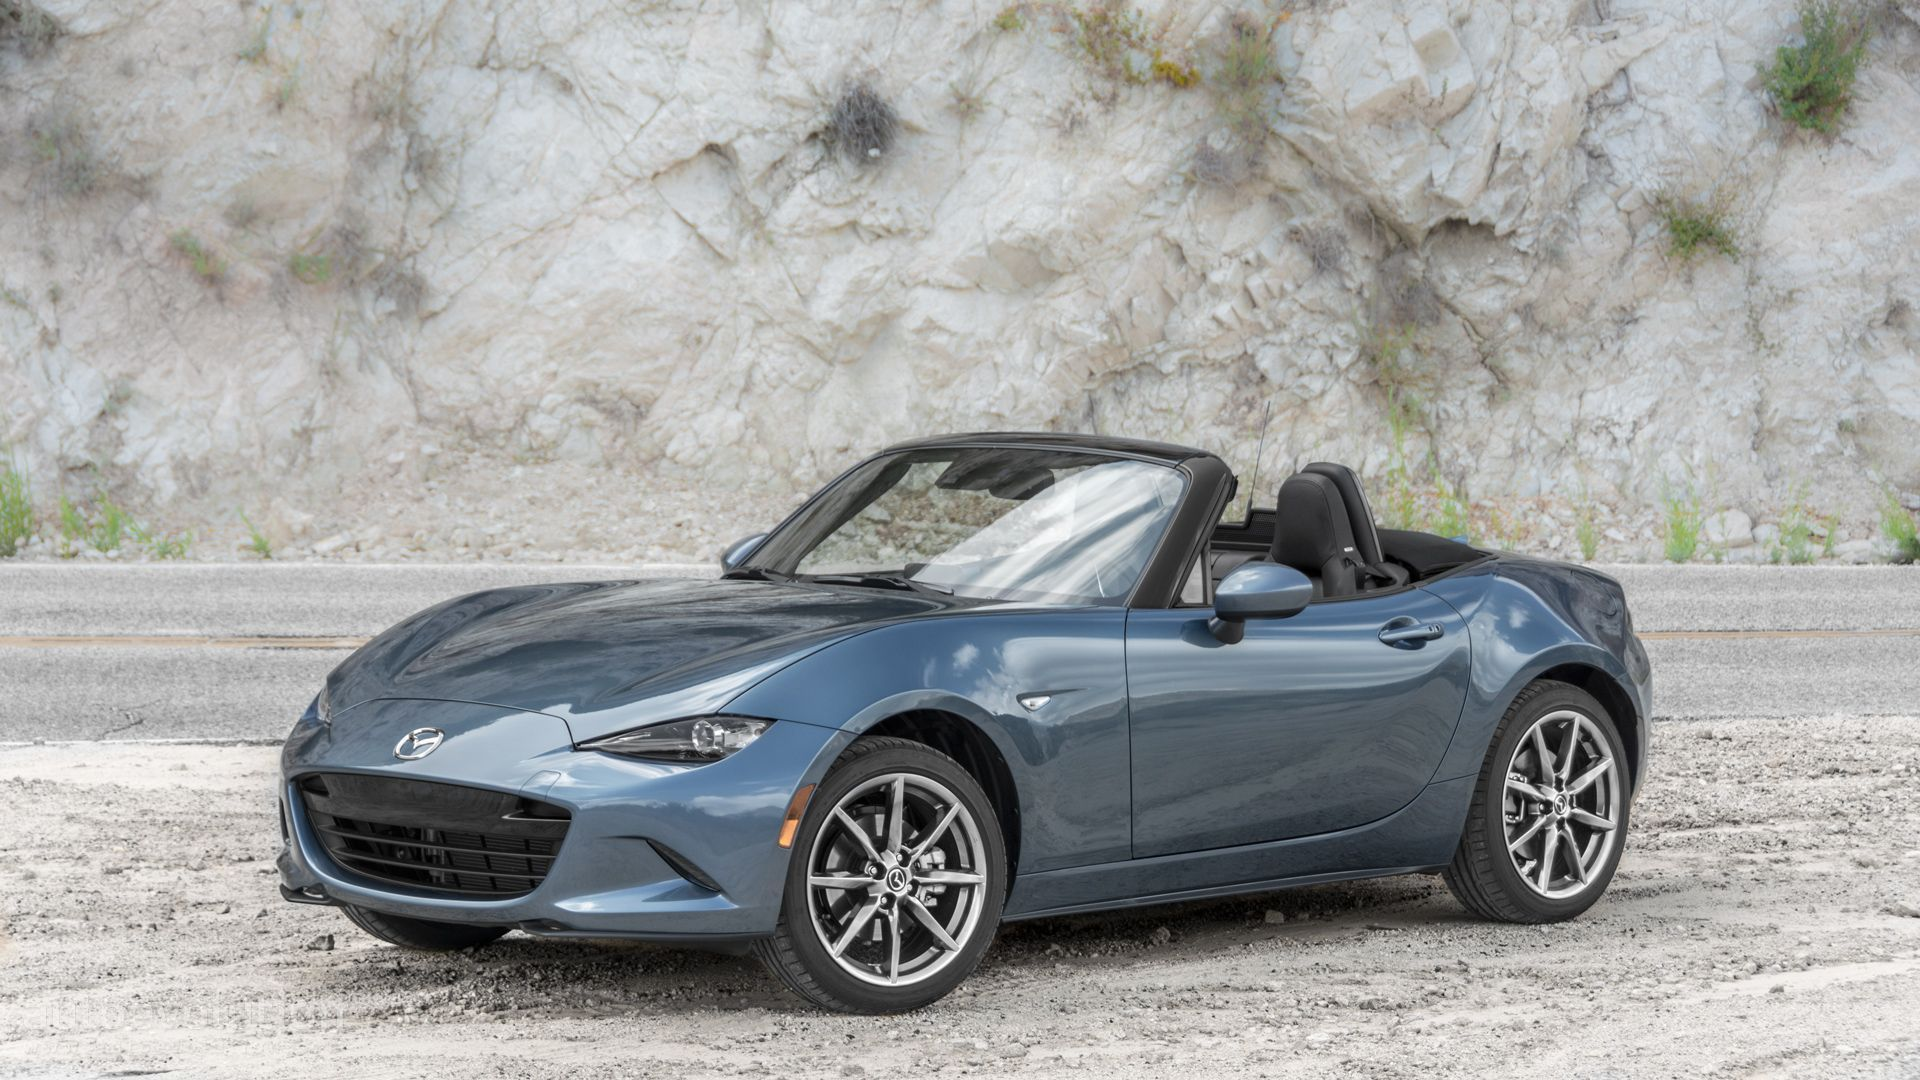 Kekurangan Mazda Mx 5 2016 Tangguh